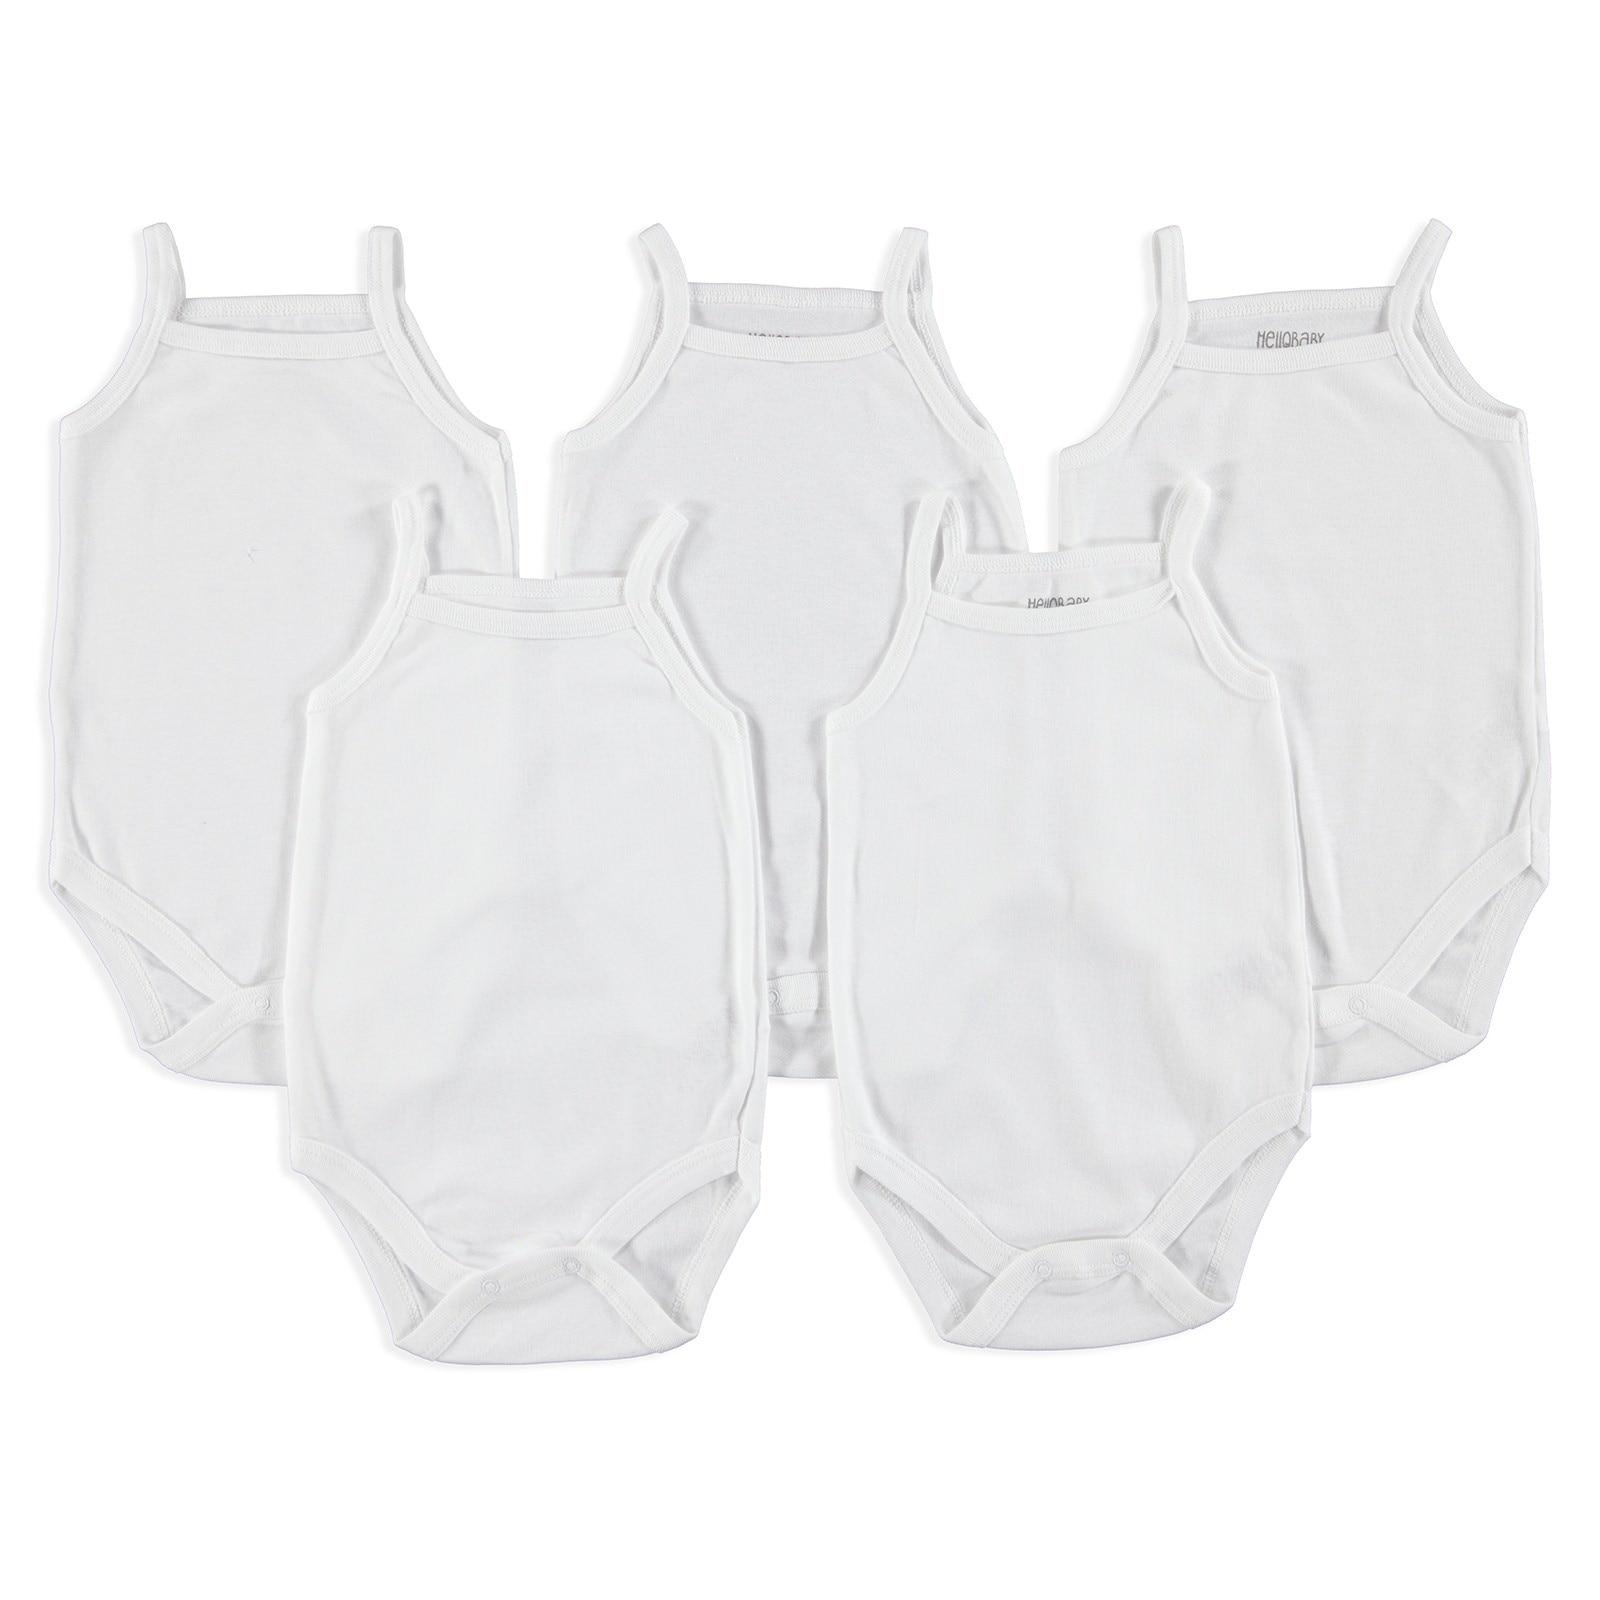 Ebebek HelloBaby Baby Sleeveless Rope Strap Bodysuit, White, 9 Months - 5 Pack